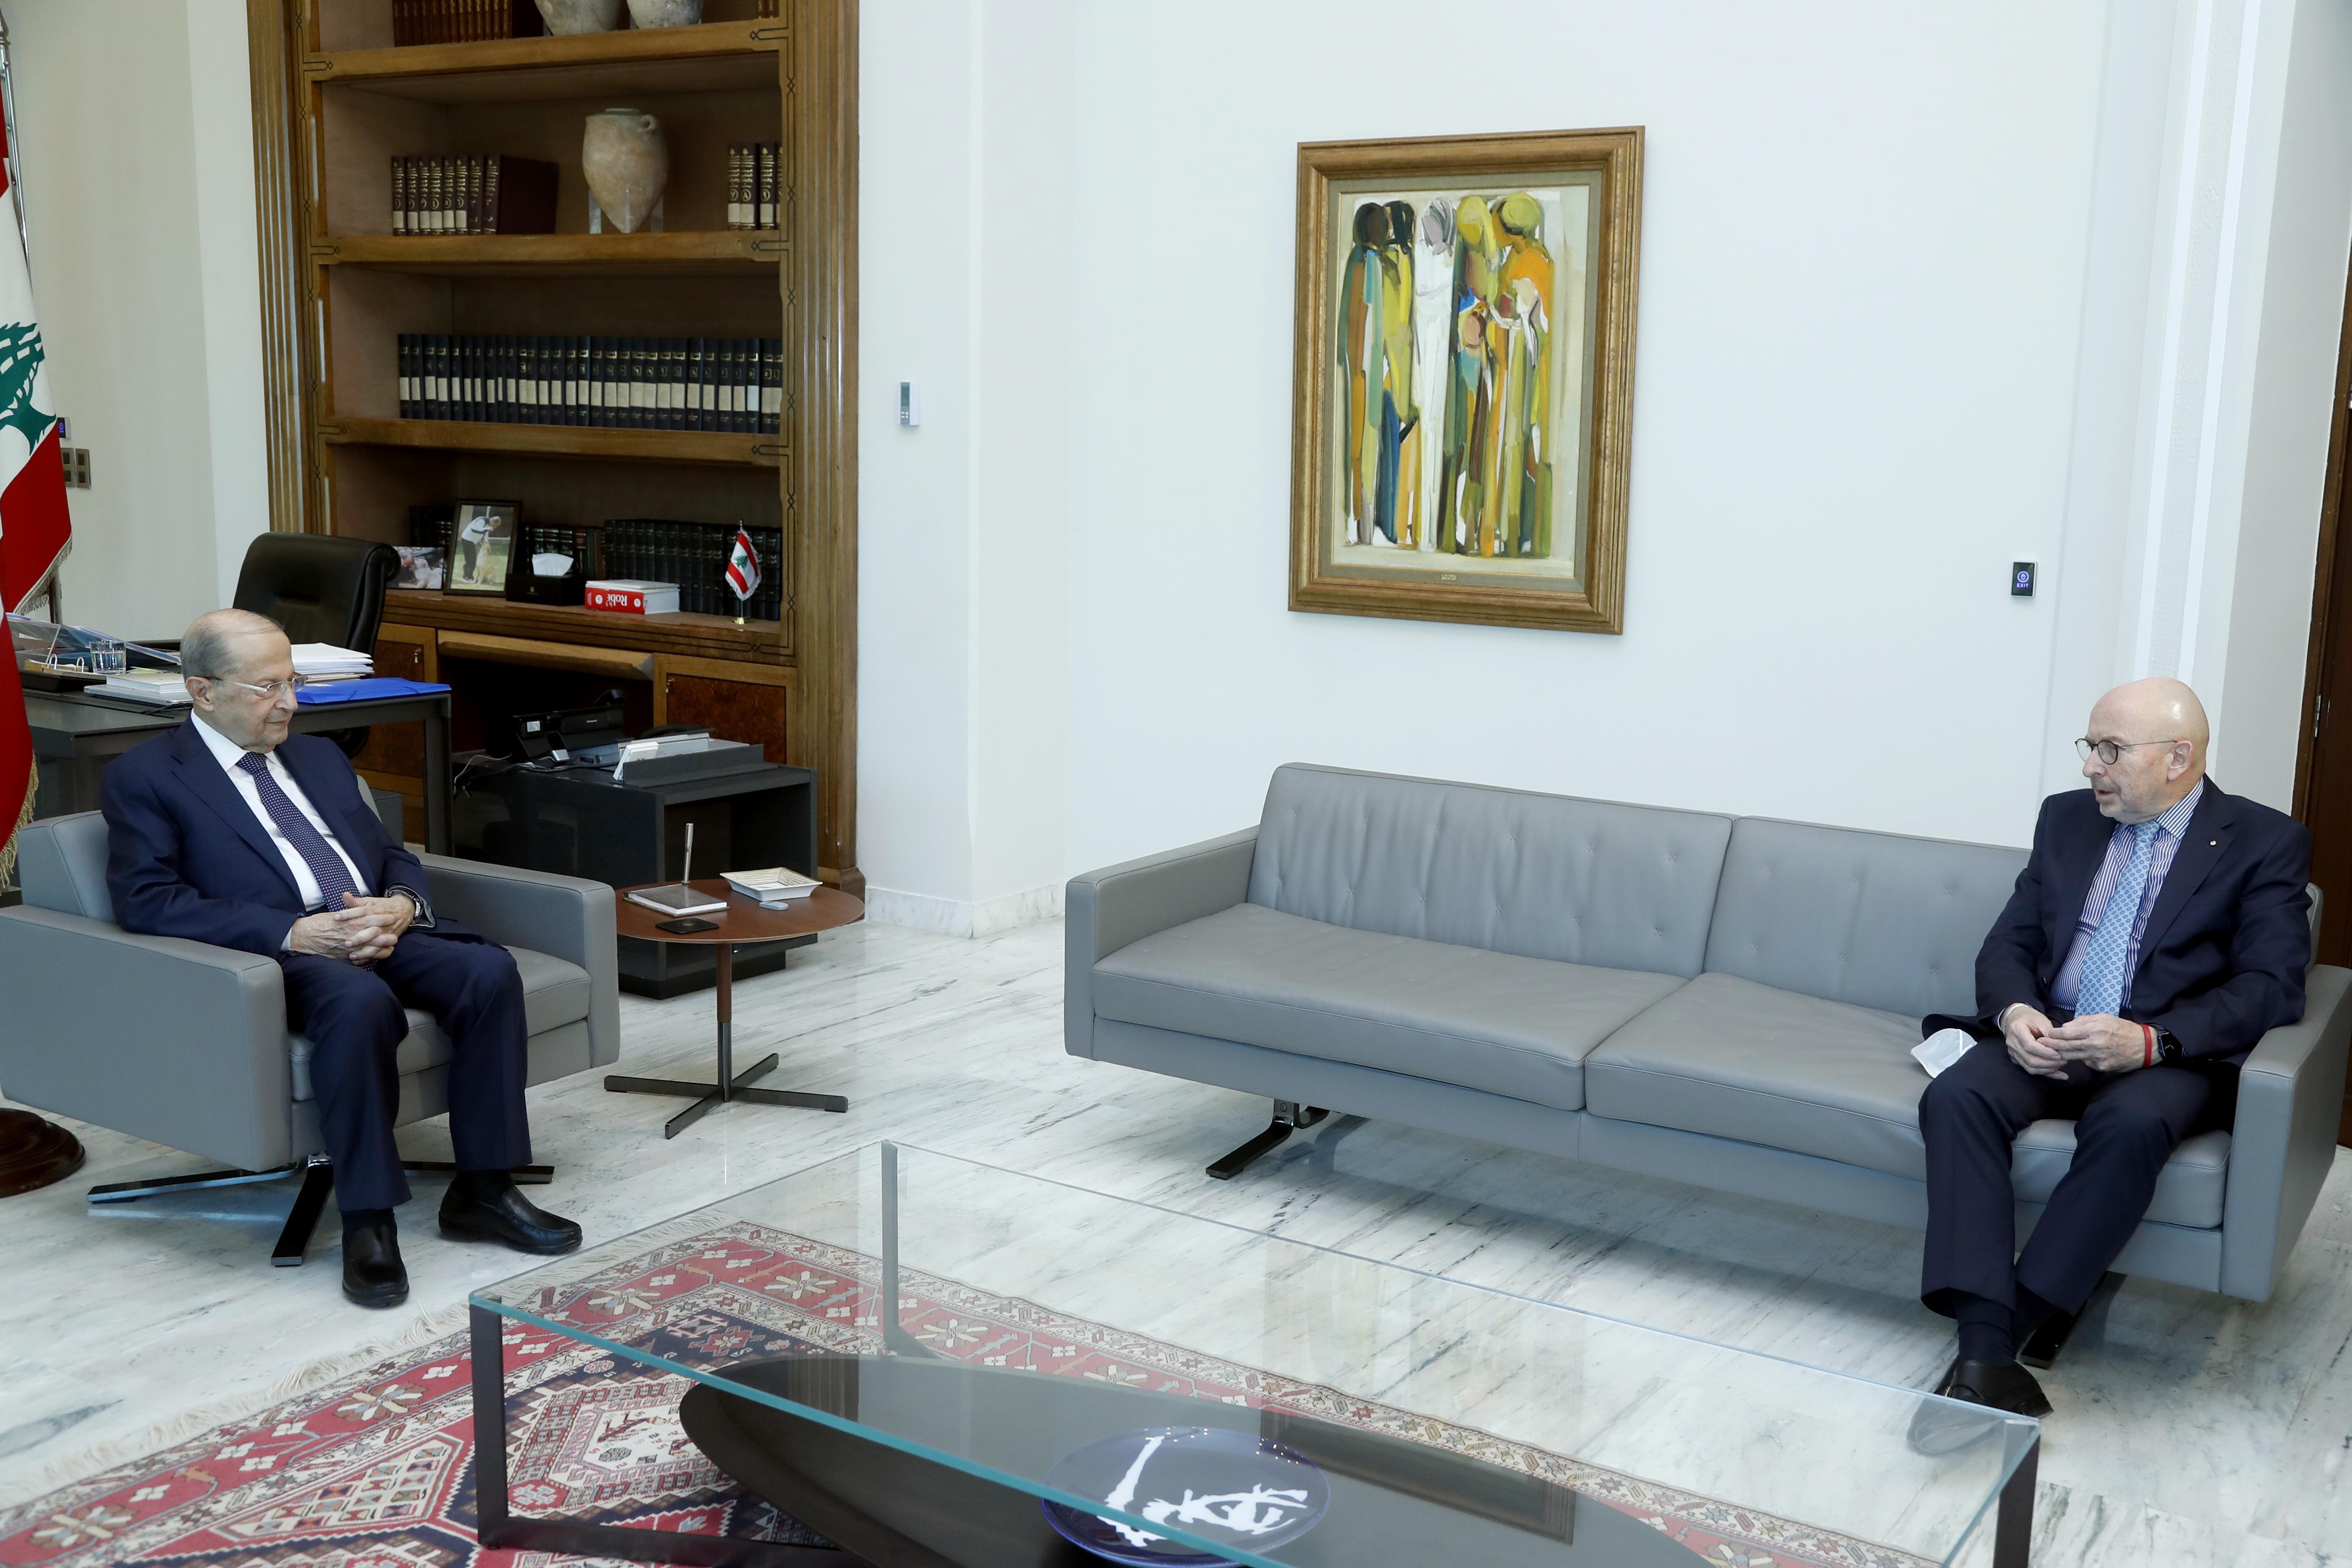 2 - Ambassador Ricardo Naro